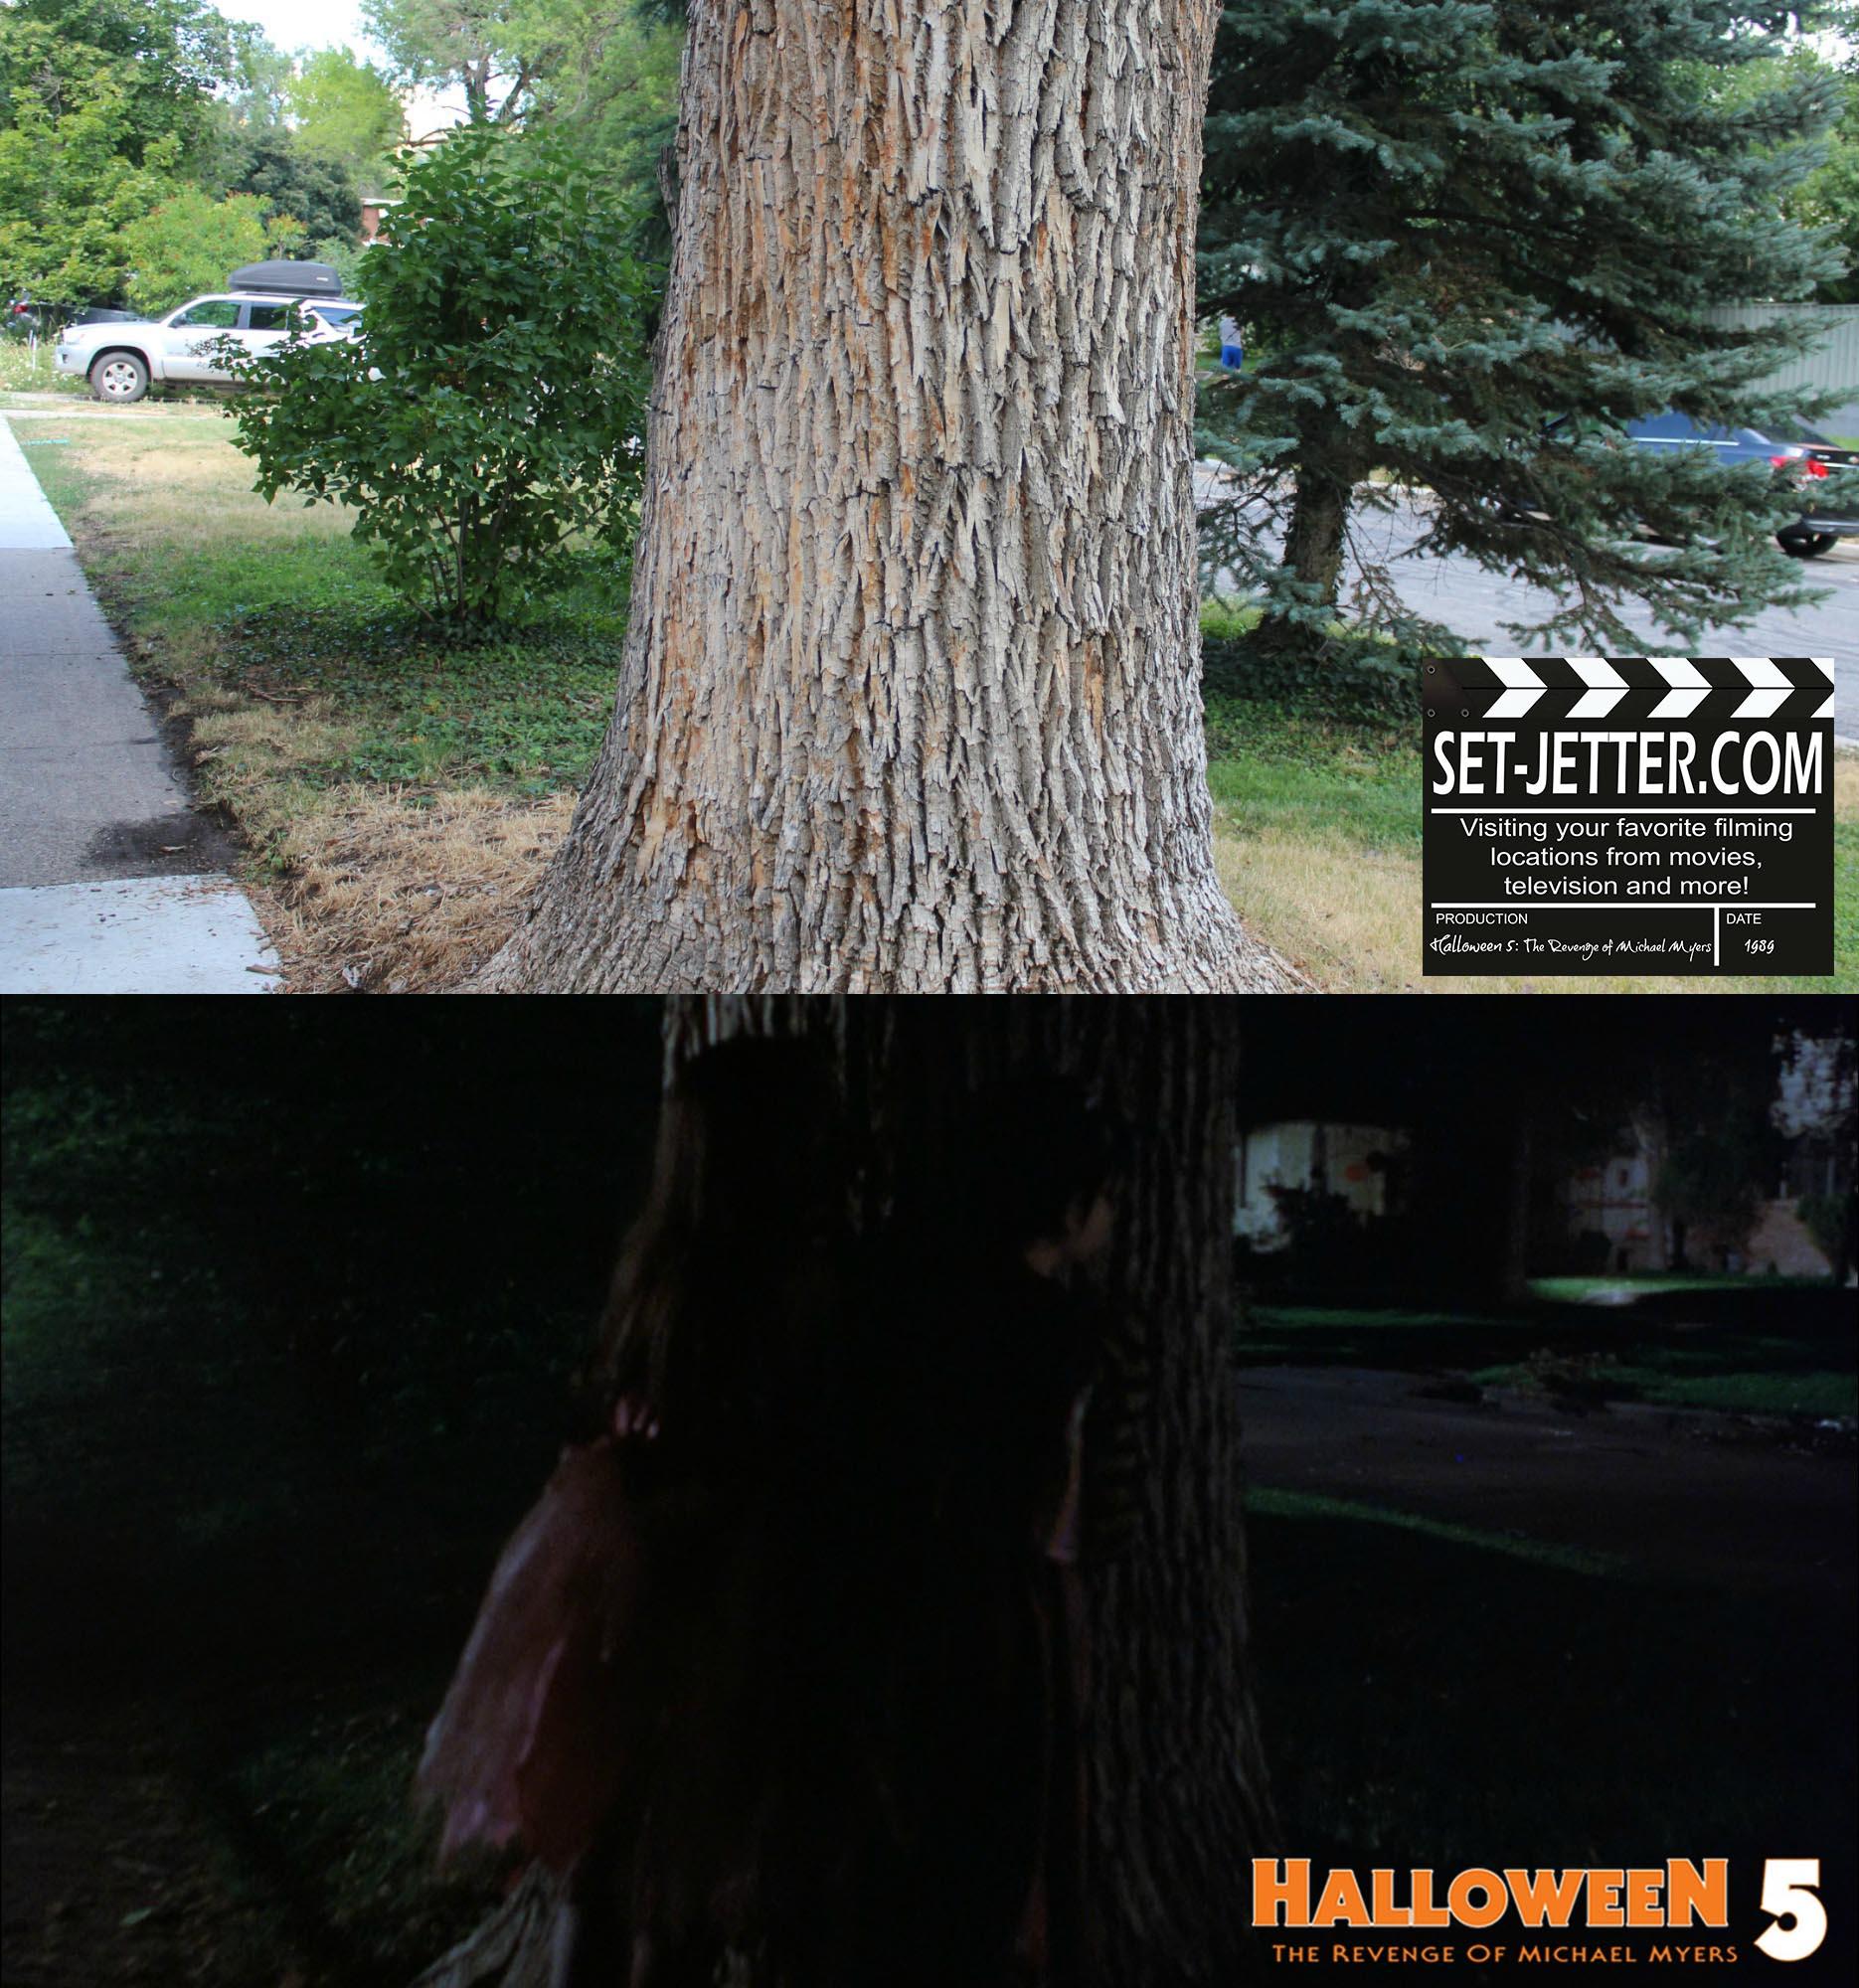 Halloween5-407.jpg